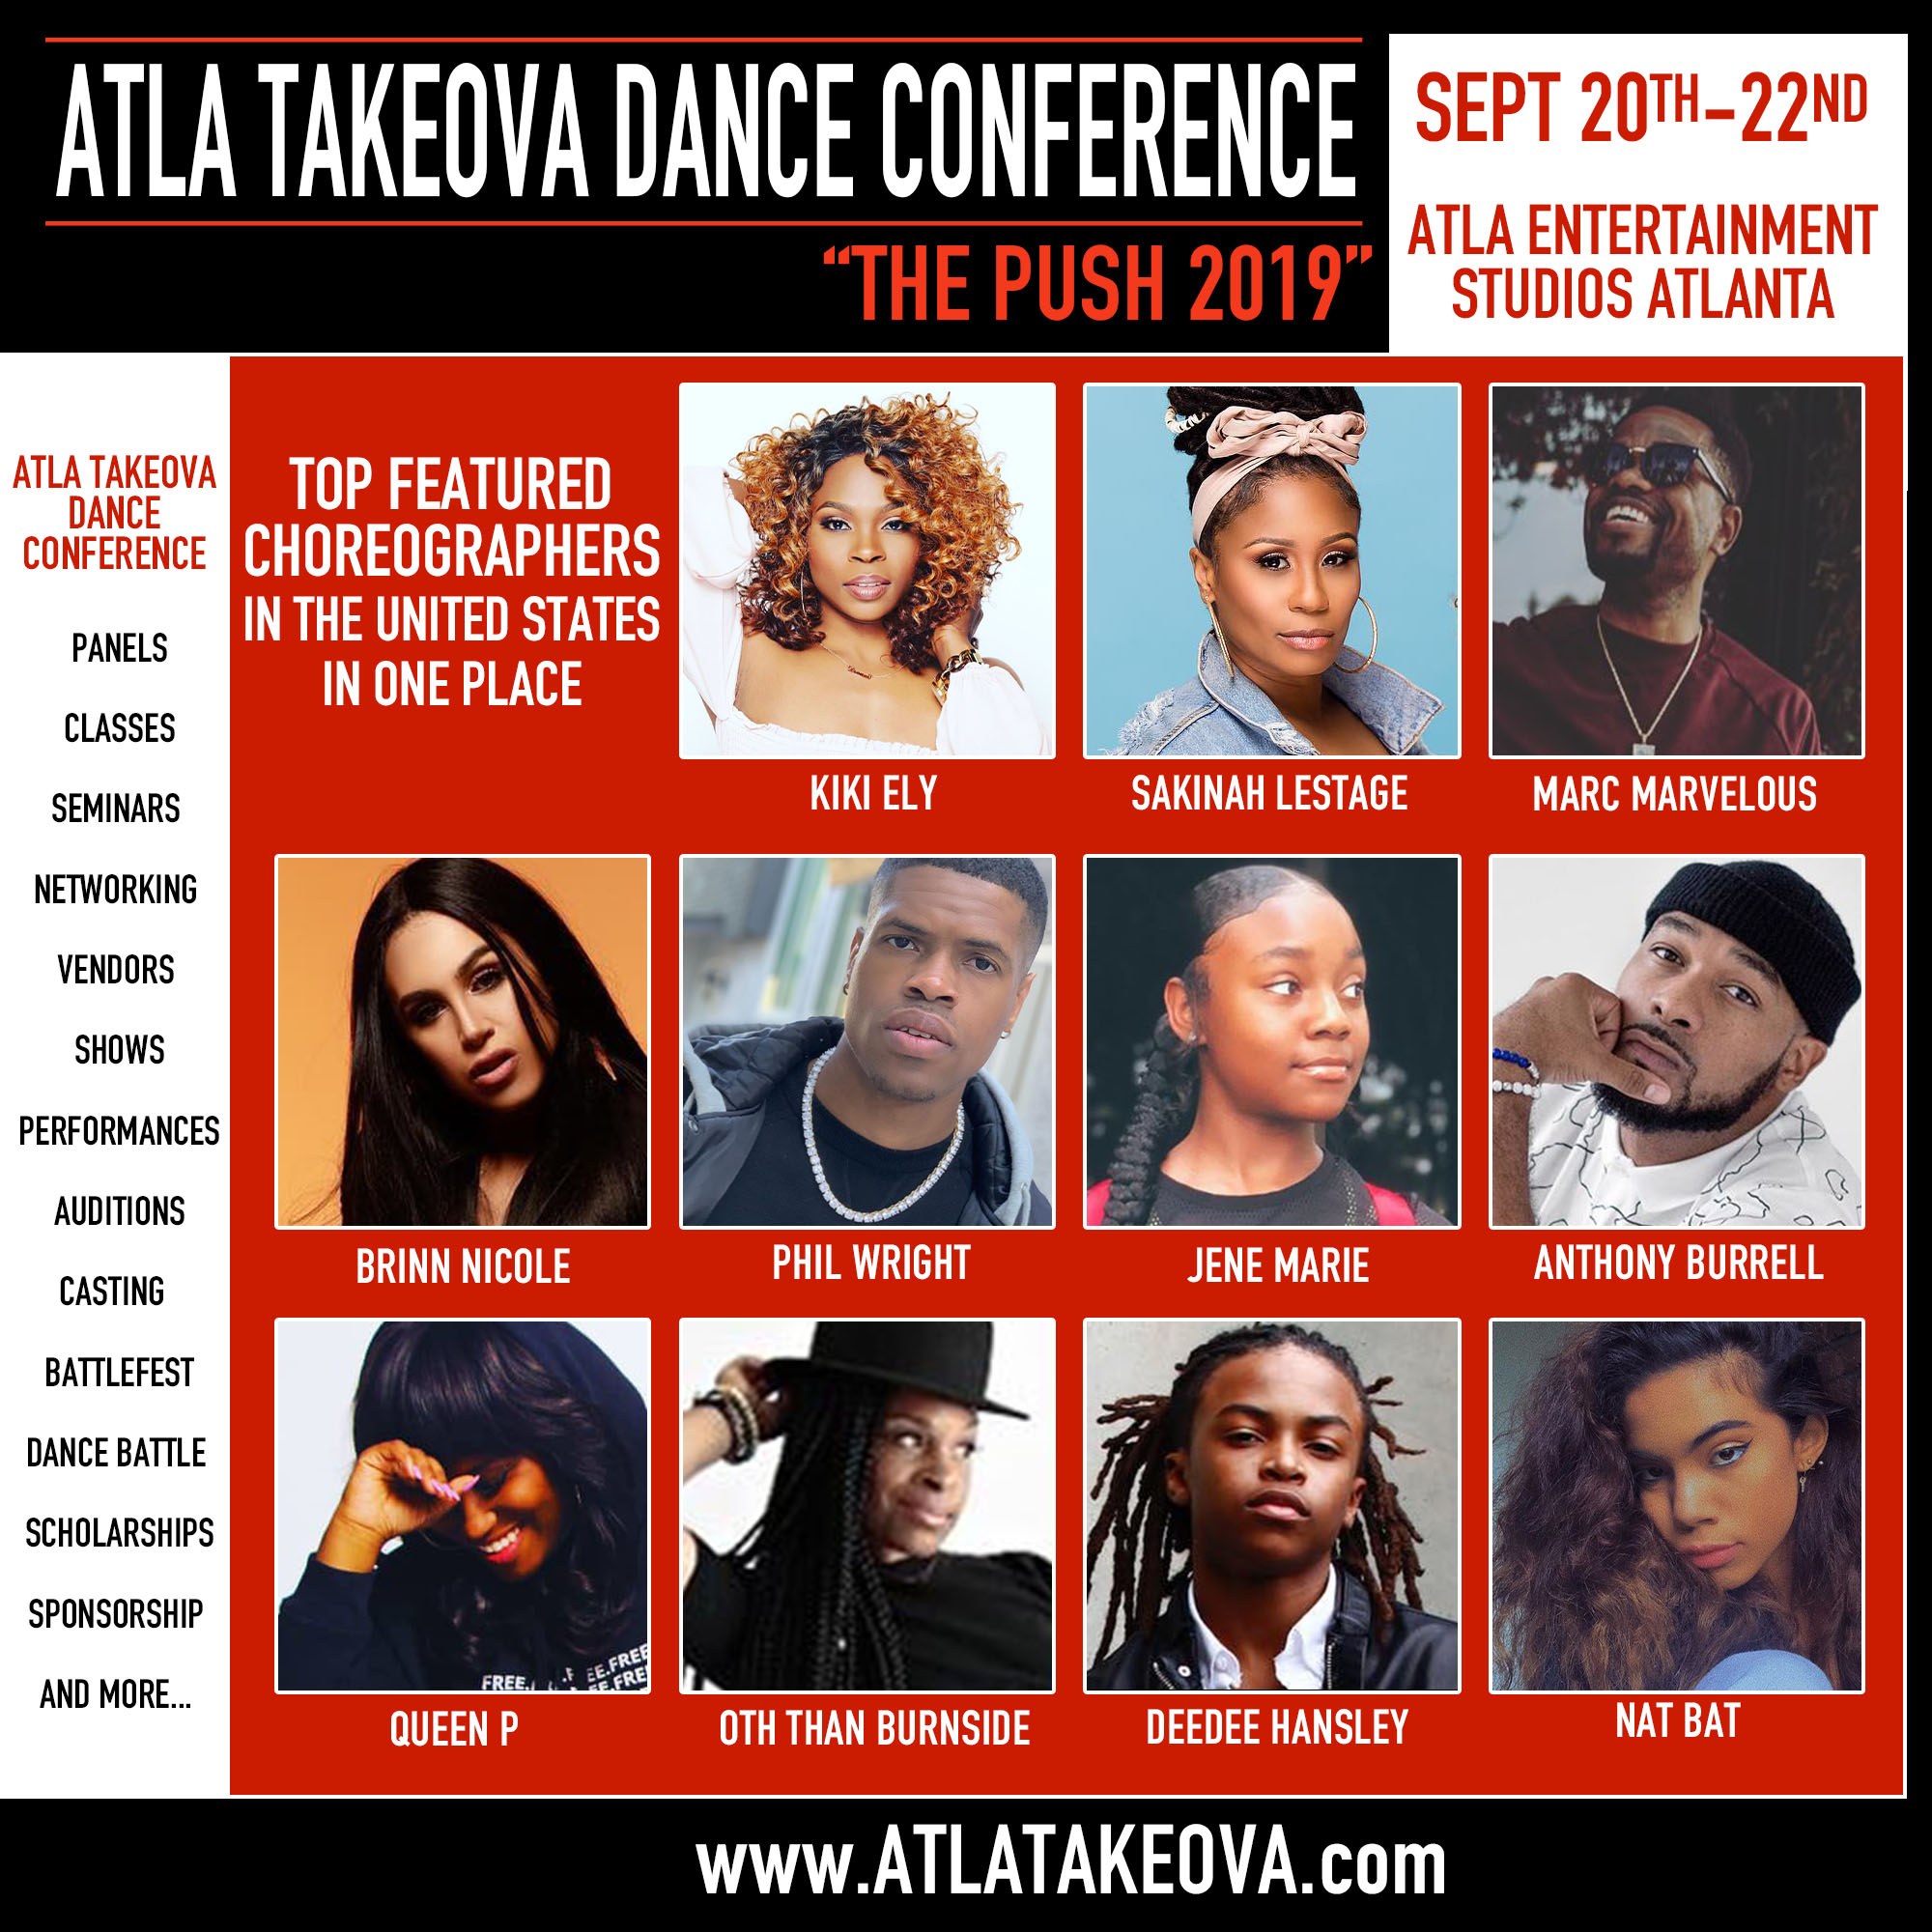 ATLA TakeOva Dance Conference